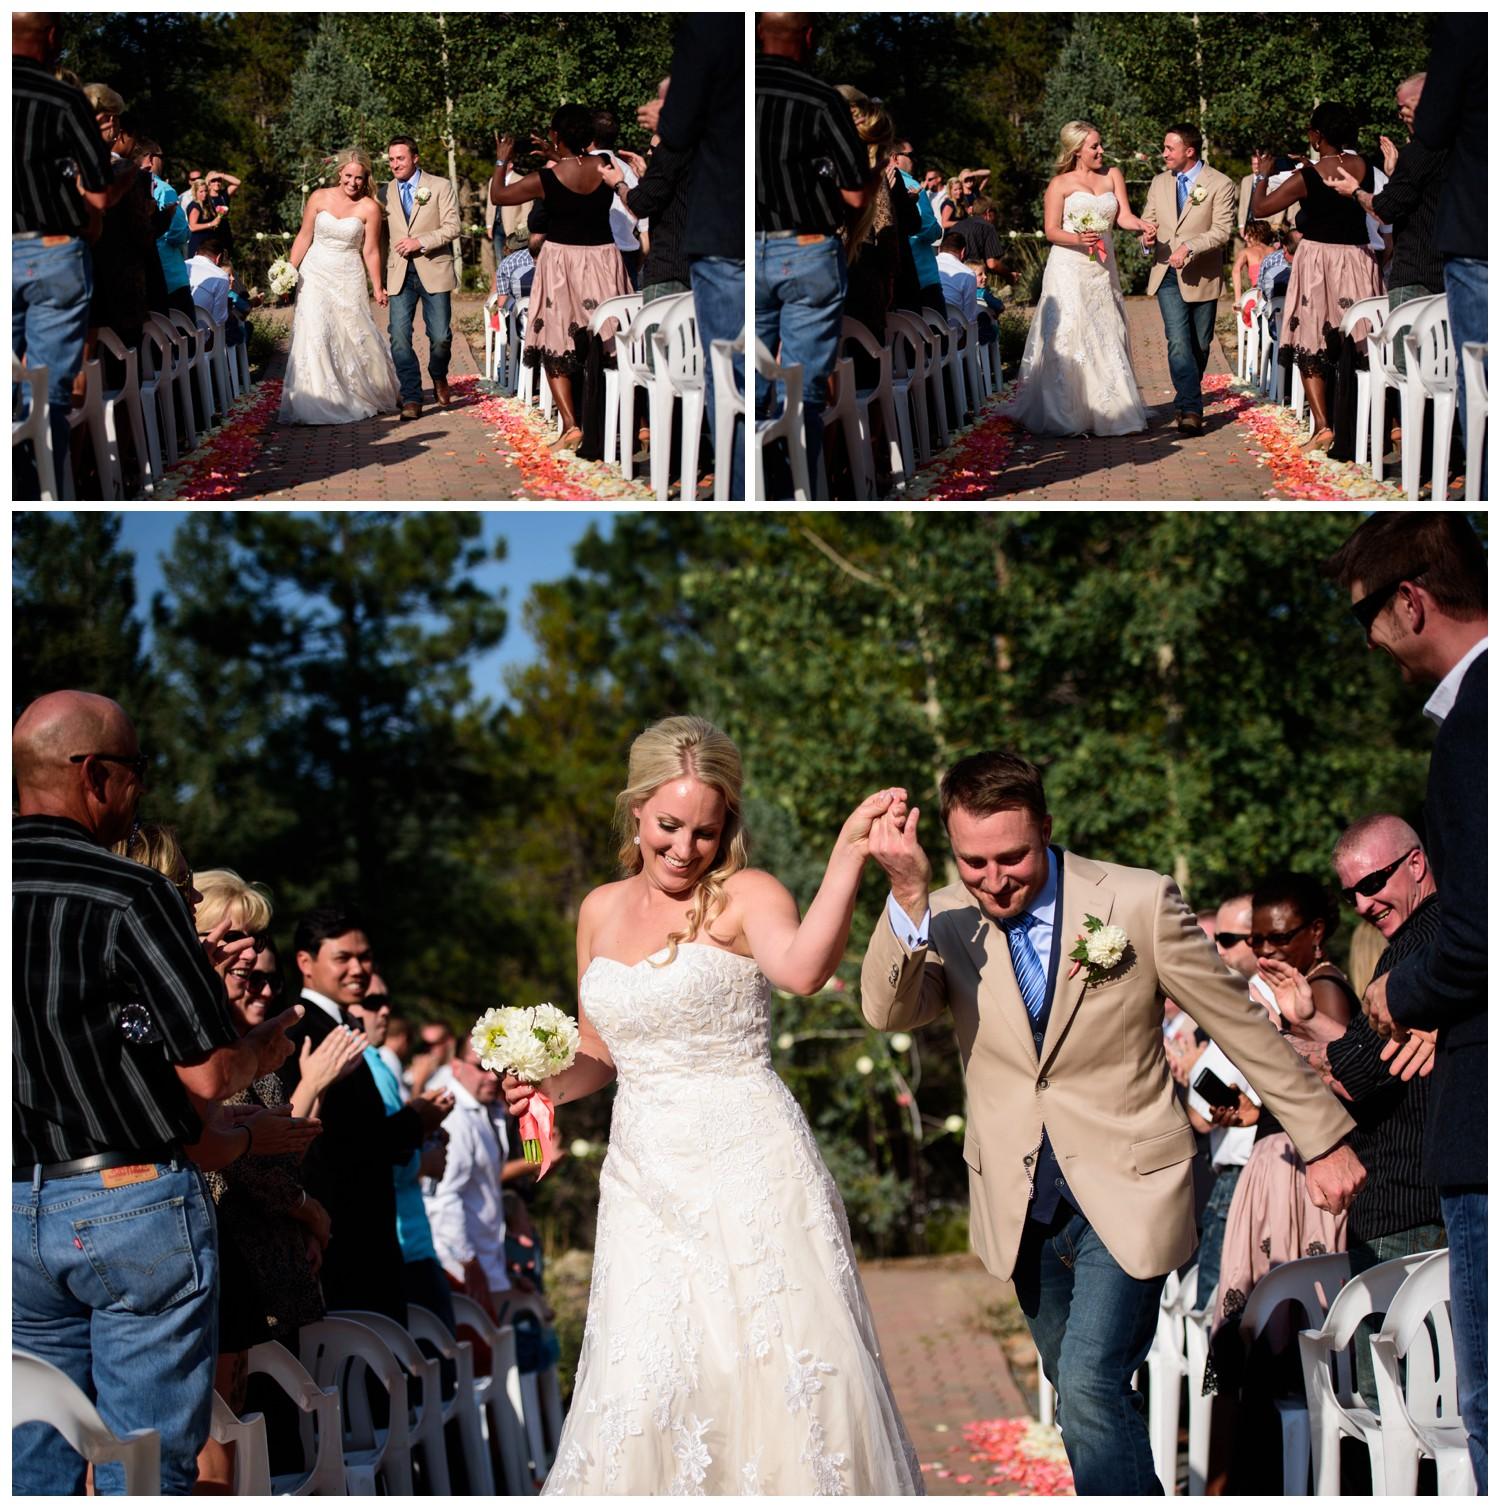 evergreen-colorado-wedding-photographer_0061.jpg